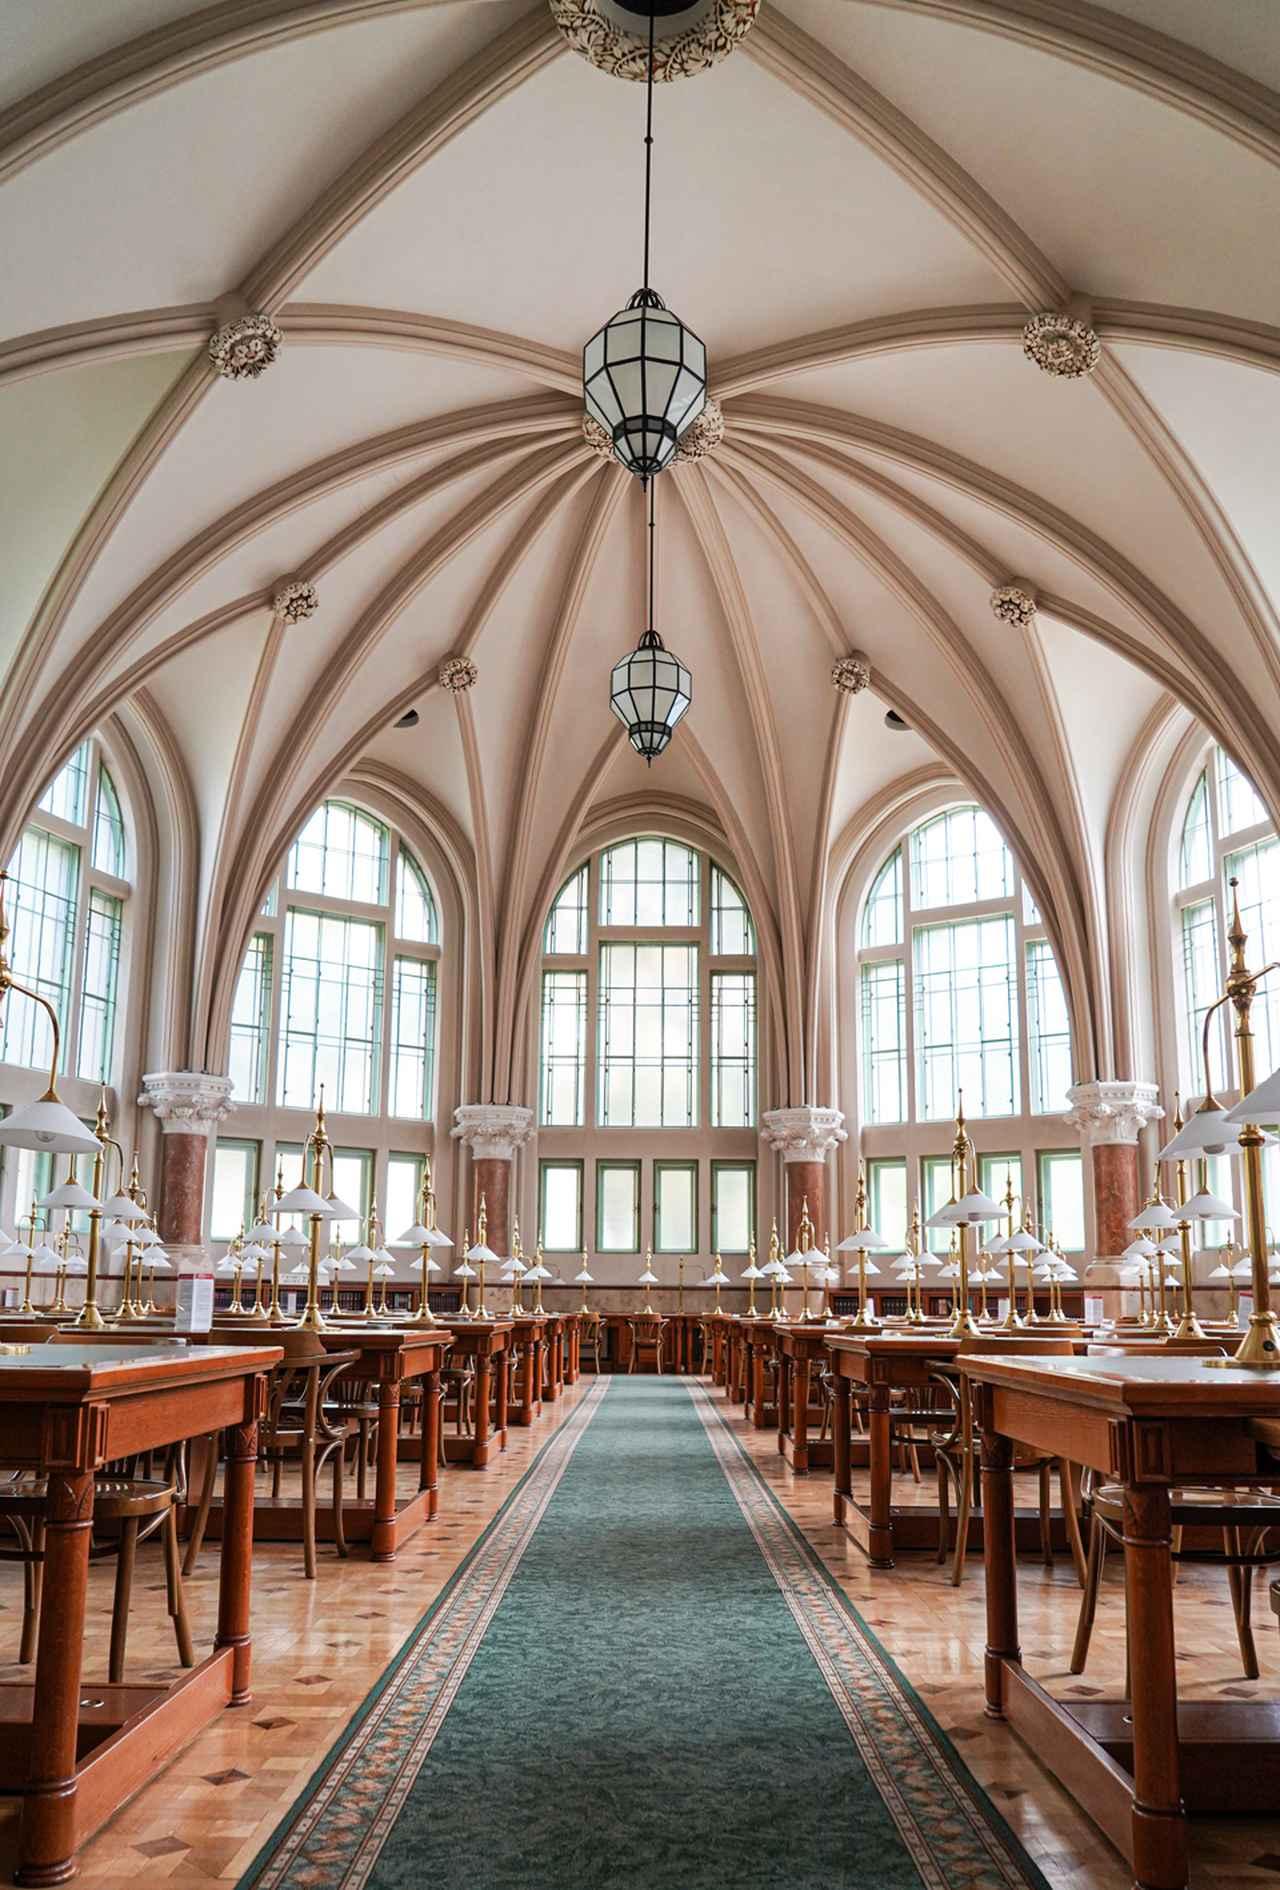 Images : ブダペスト工科経済大学